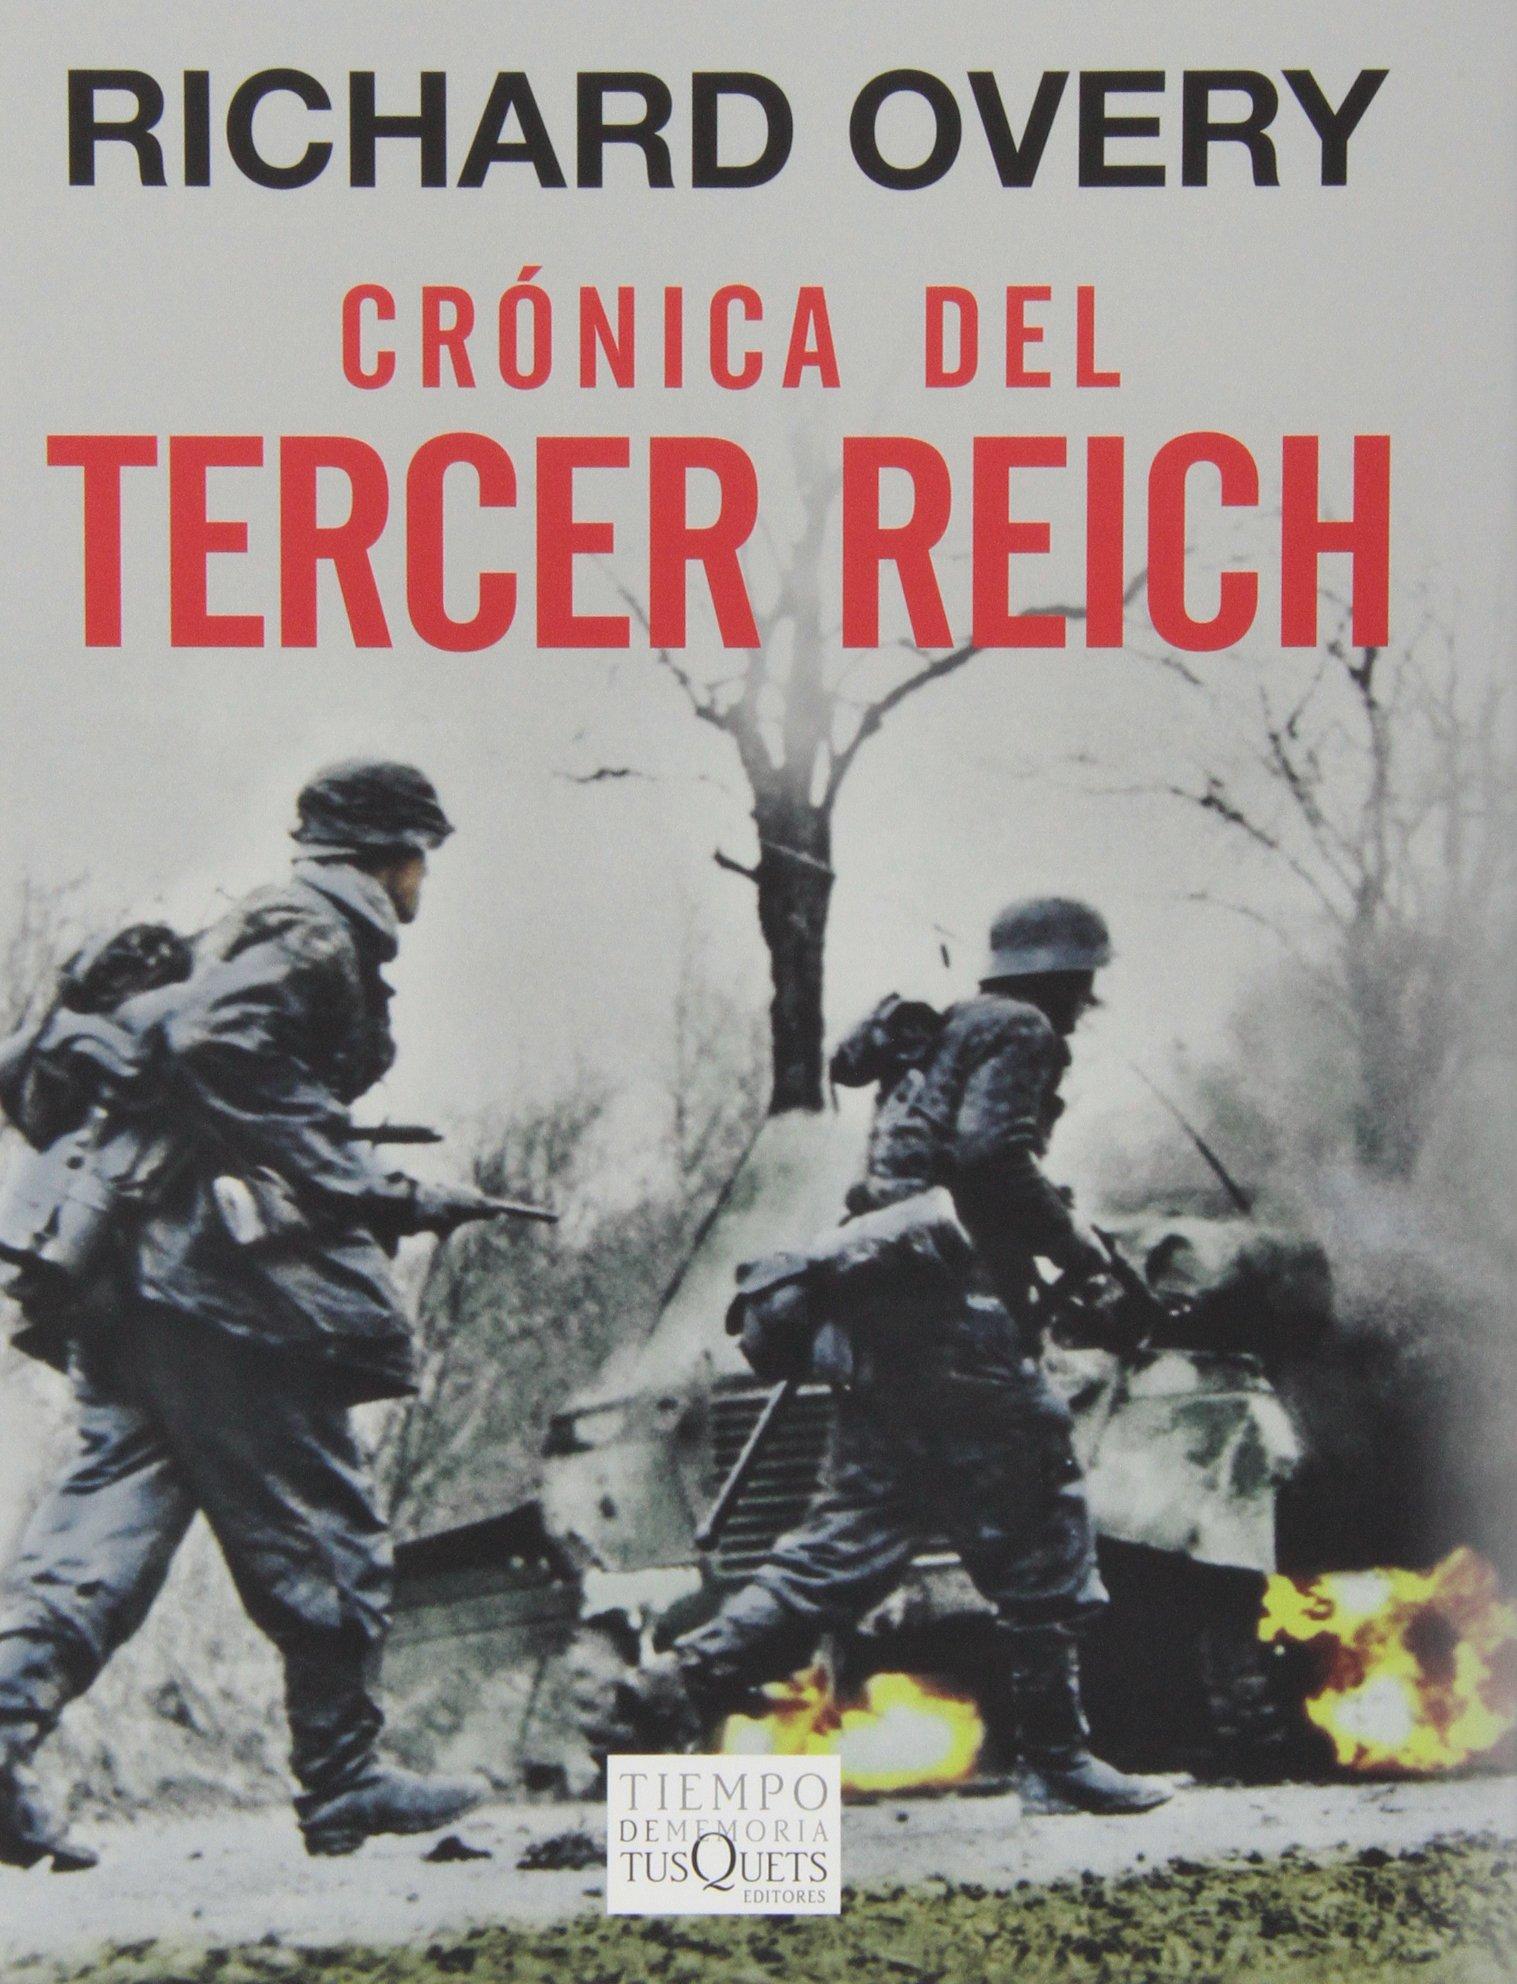 Crónica del Tercer Reich, de Richard Overy